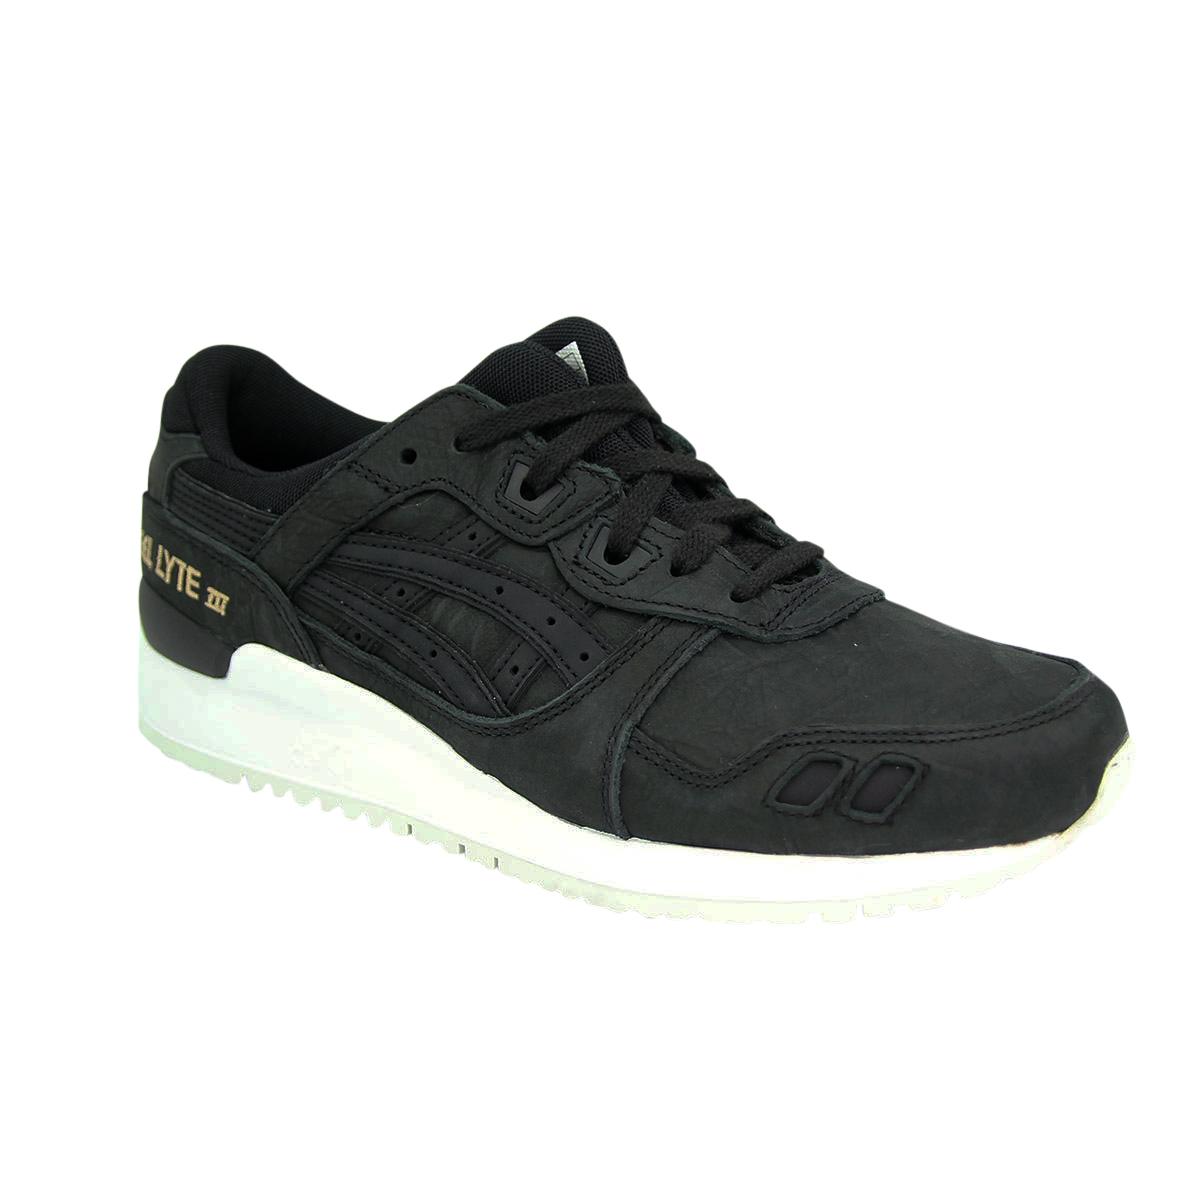 eac6ef8e30f27e Asics GEL-LYTE III STR Damen Sneakers Schuhe Neu